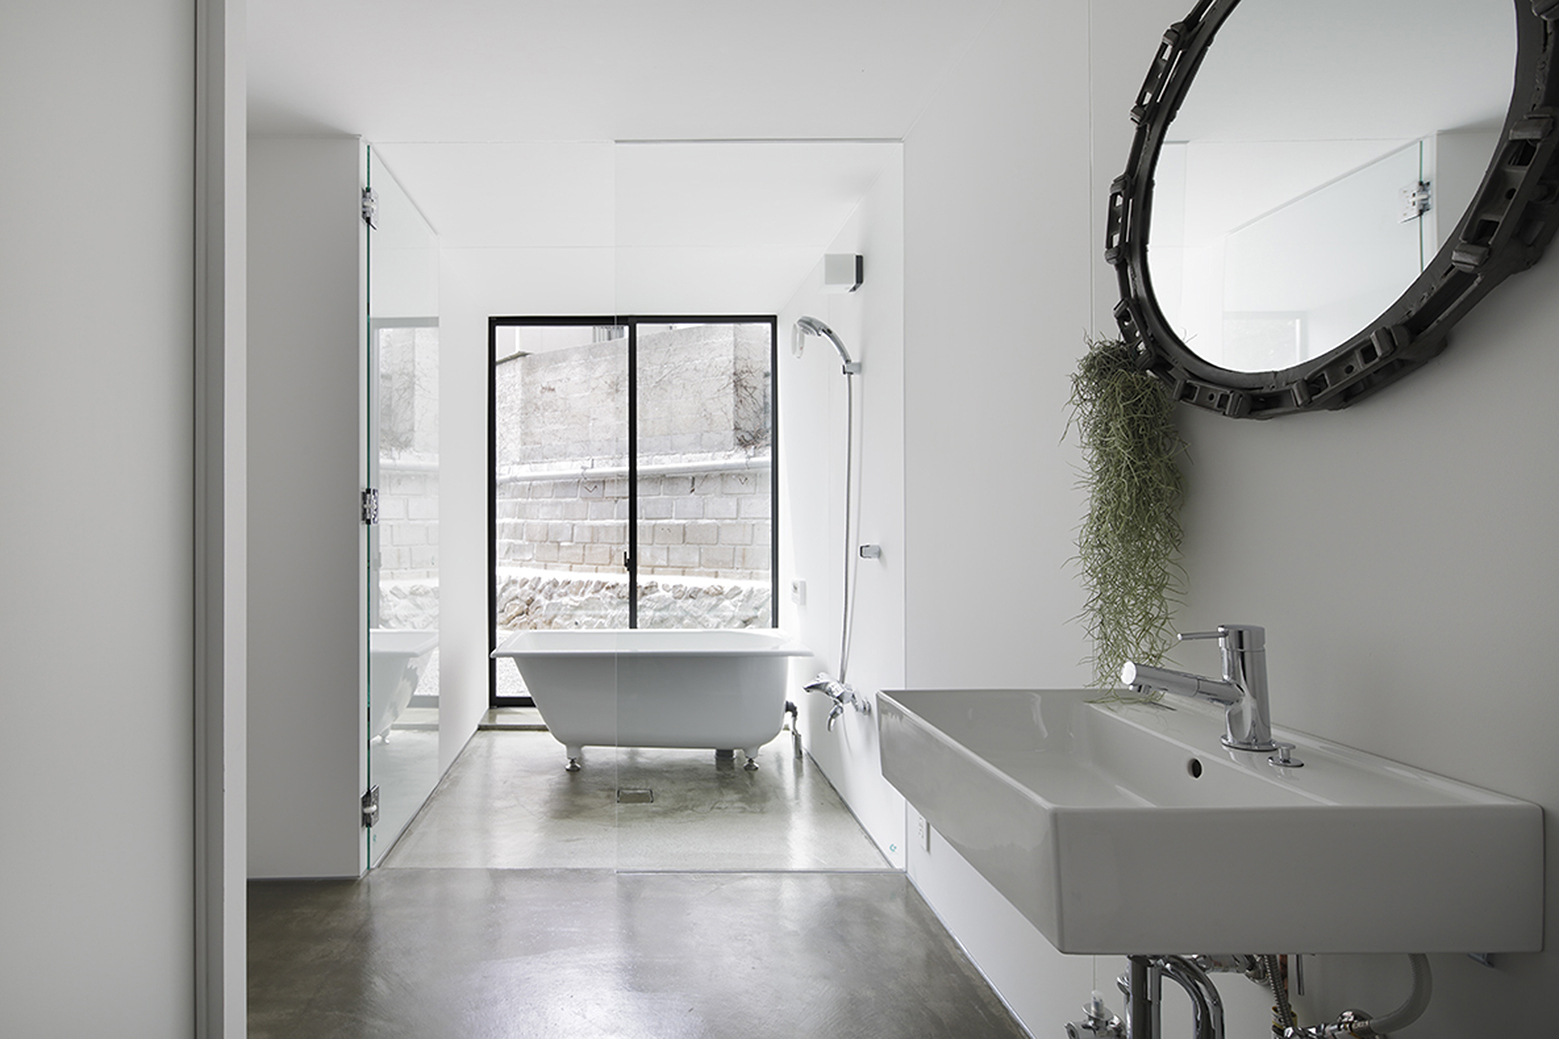 540ea194c07a802ff5000175_house-in-miyake-hidetaka-nakahara-architects-yoshio-ohno-architects_oono_miyake_140407_034